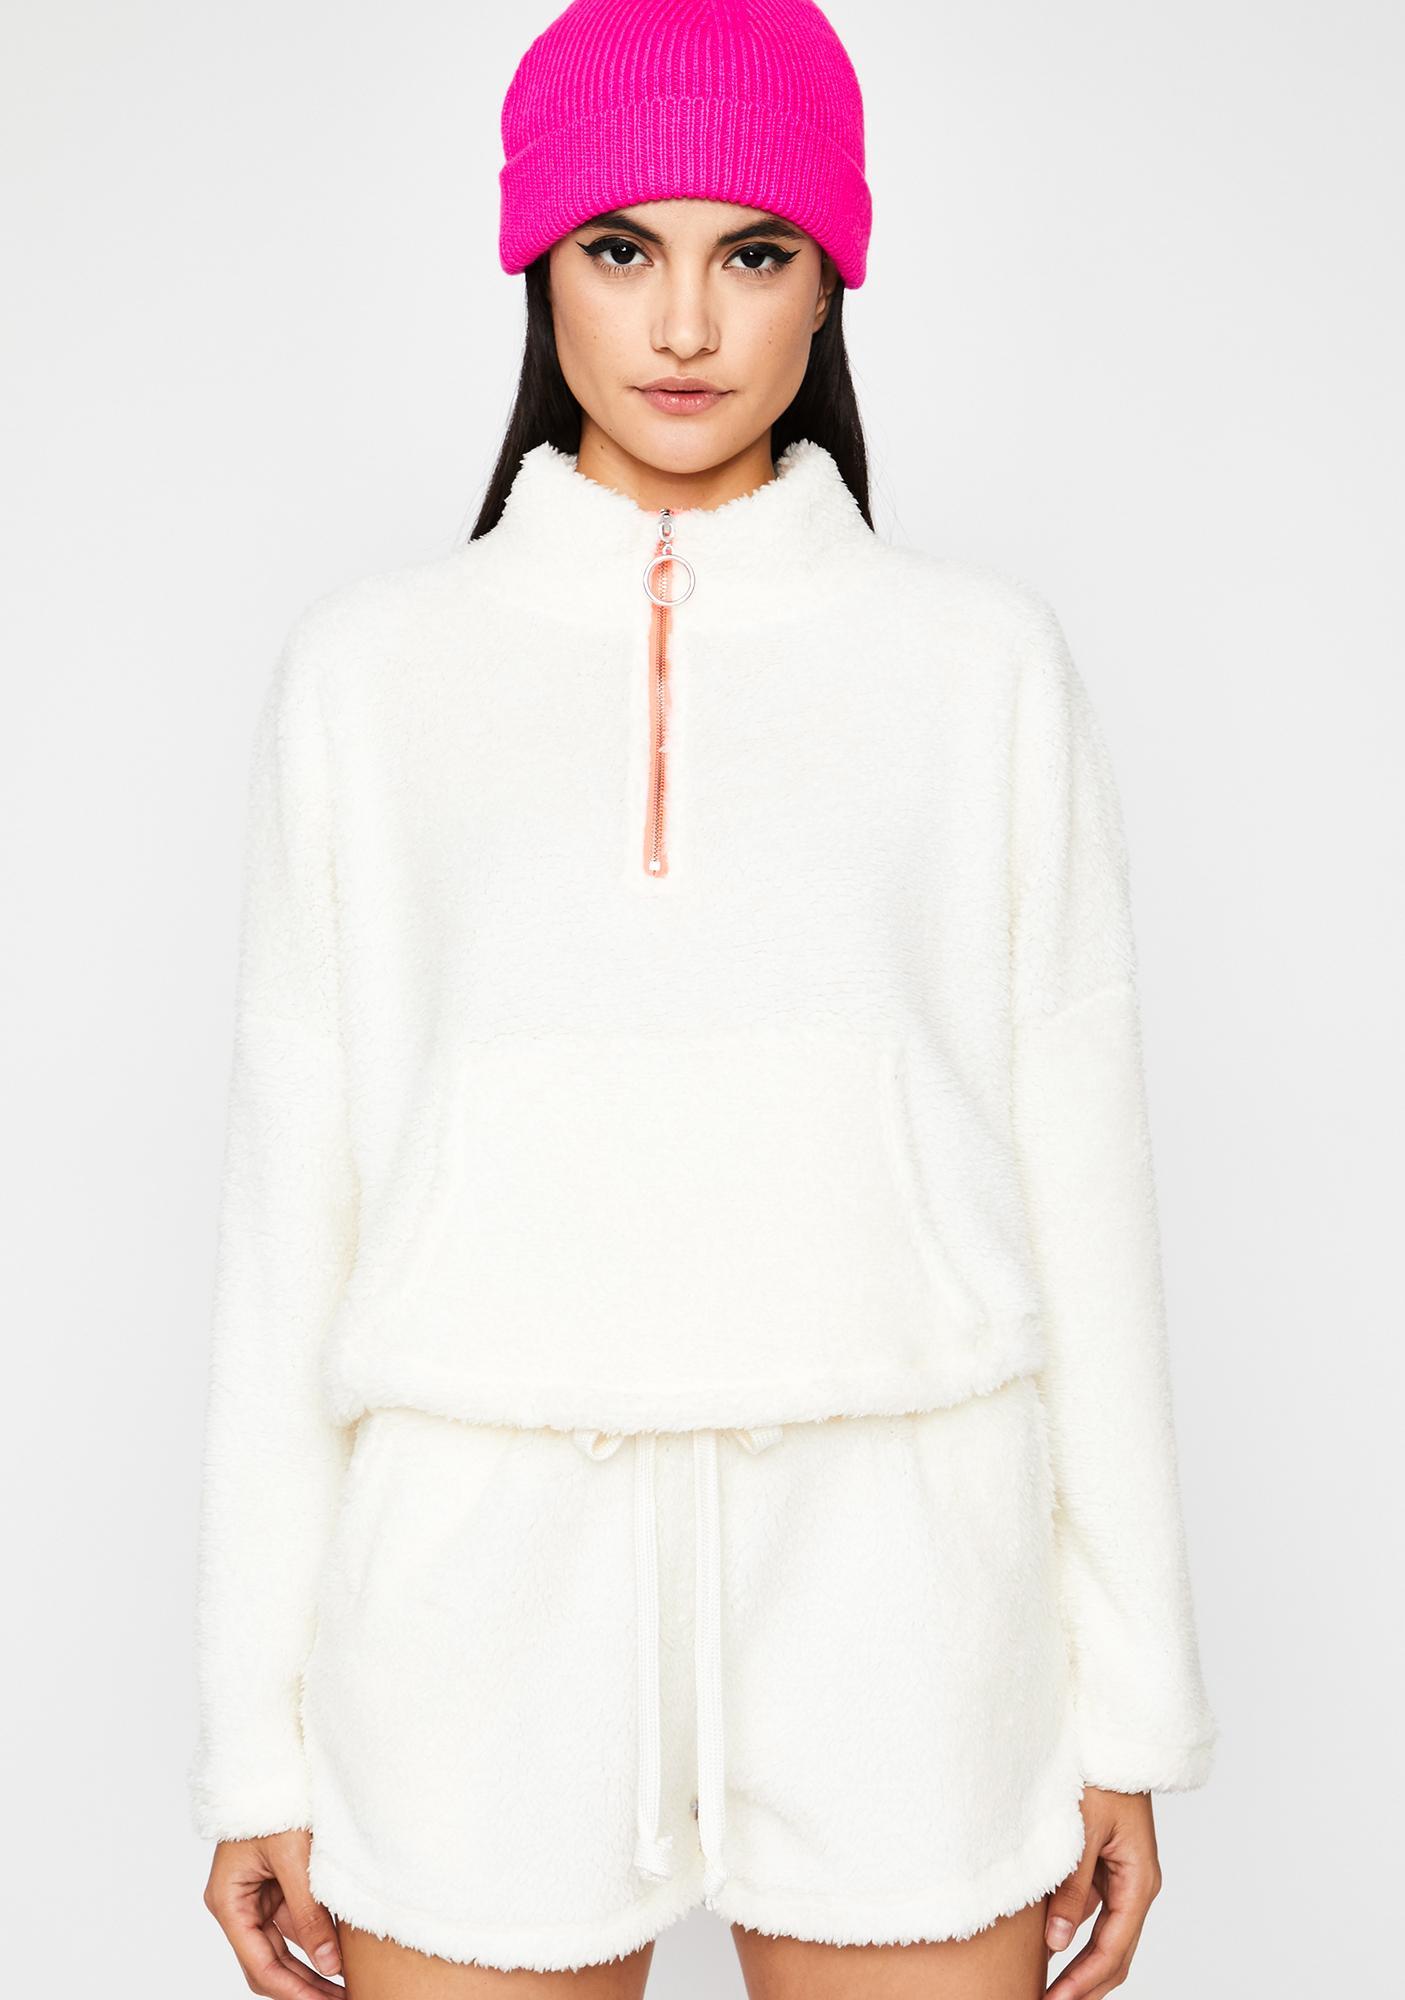 Polar Bear Fuzzy Shorts Set by